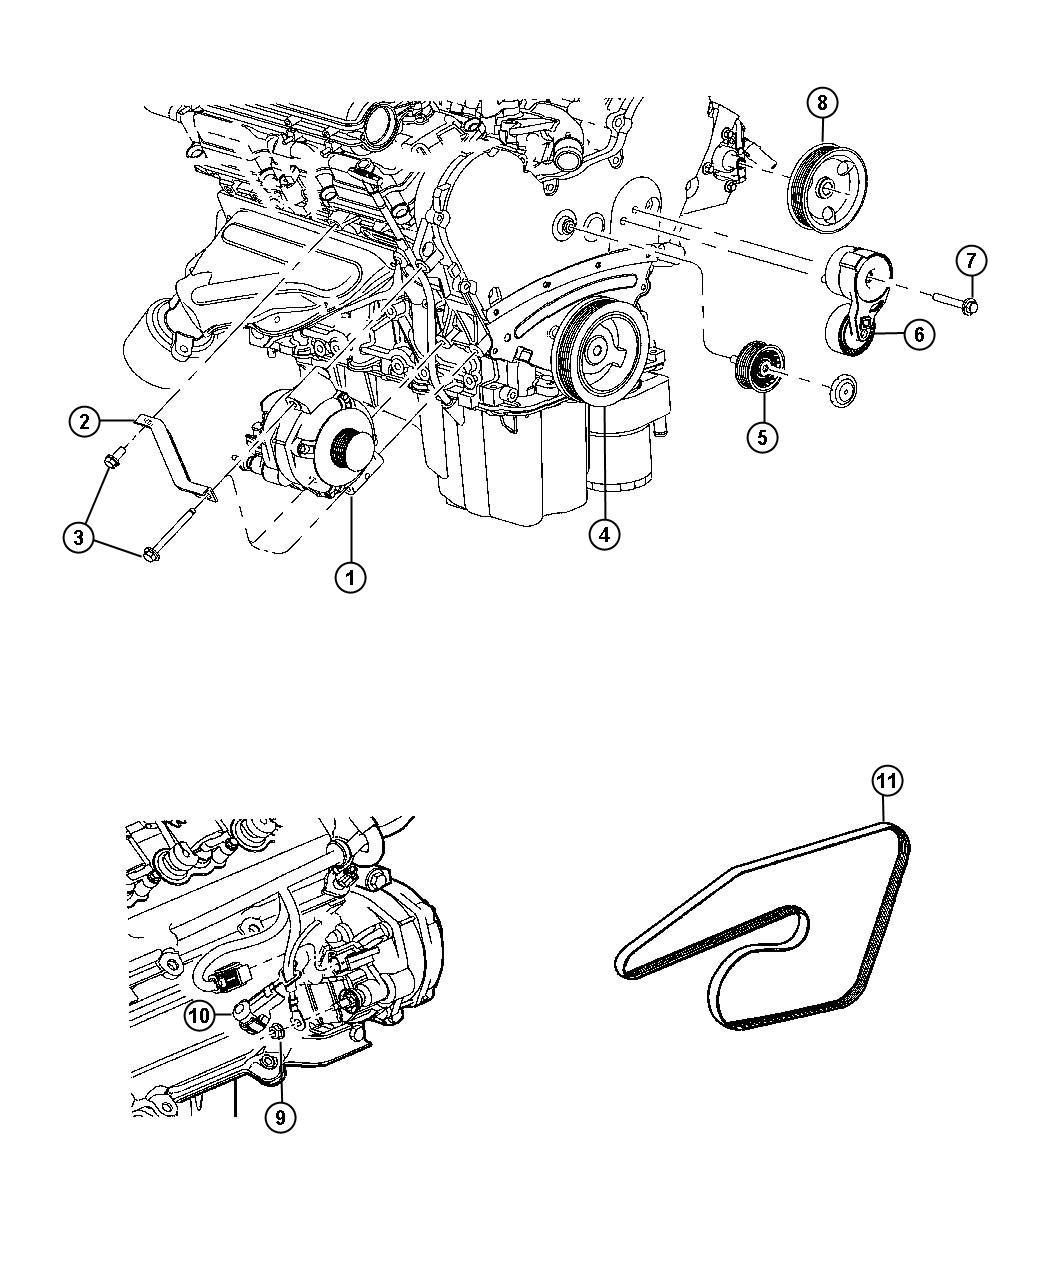 2007 Chrysler Tensioner, tensioner arm. Belt, pivot